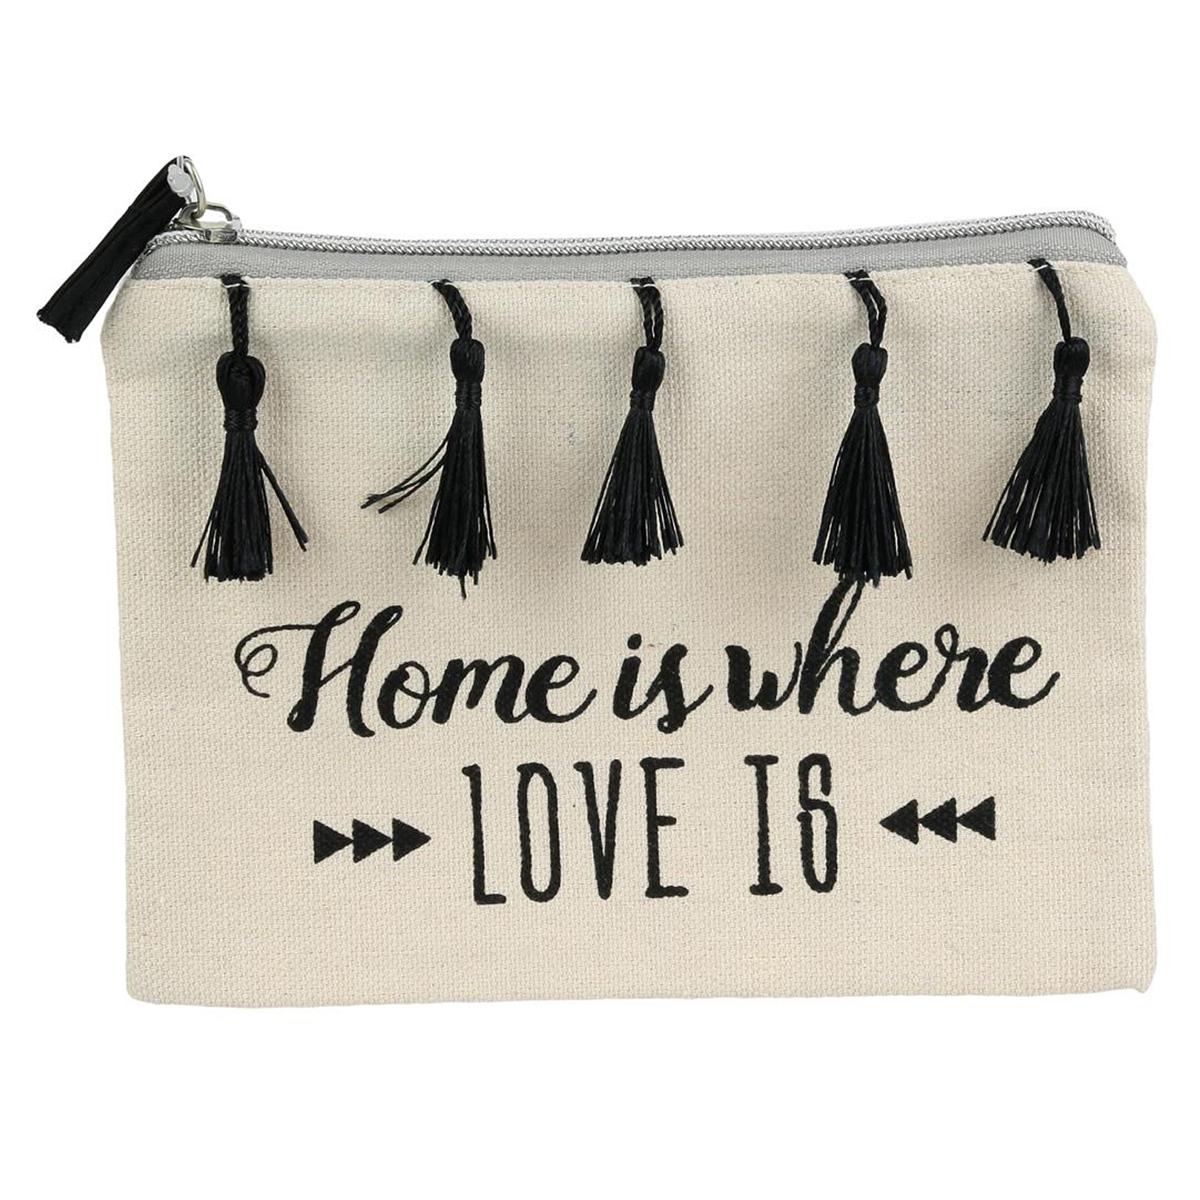 Pochette plate \'Boho\' beige noir (Home is where love is) - 19x135 cm - [Q3931]